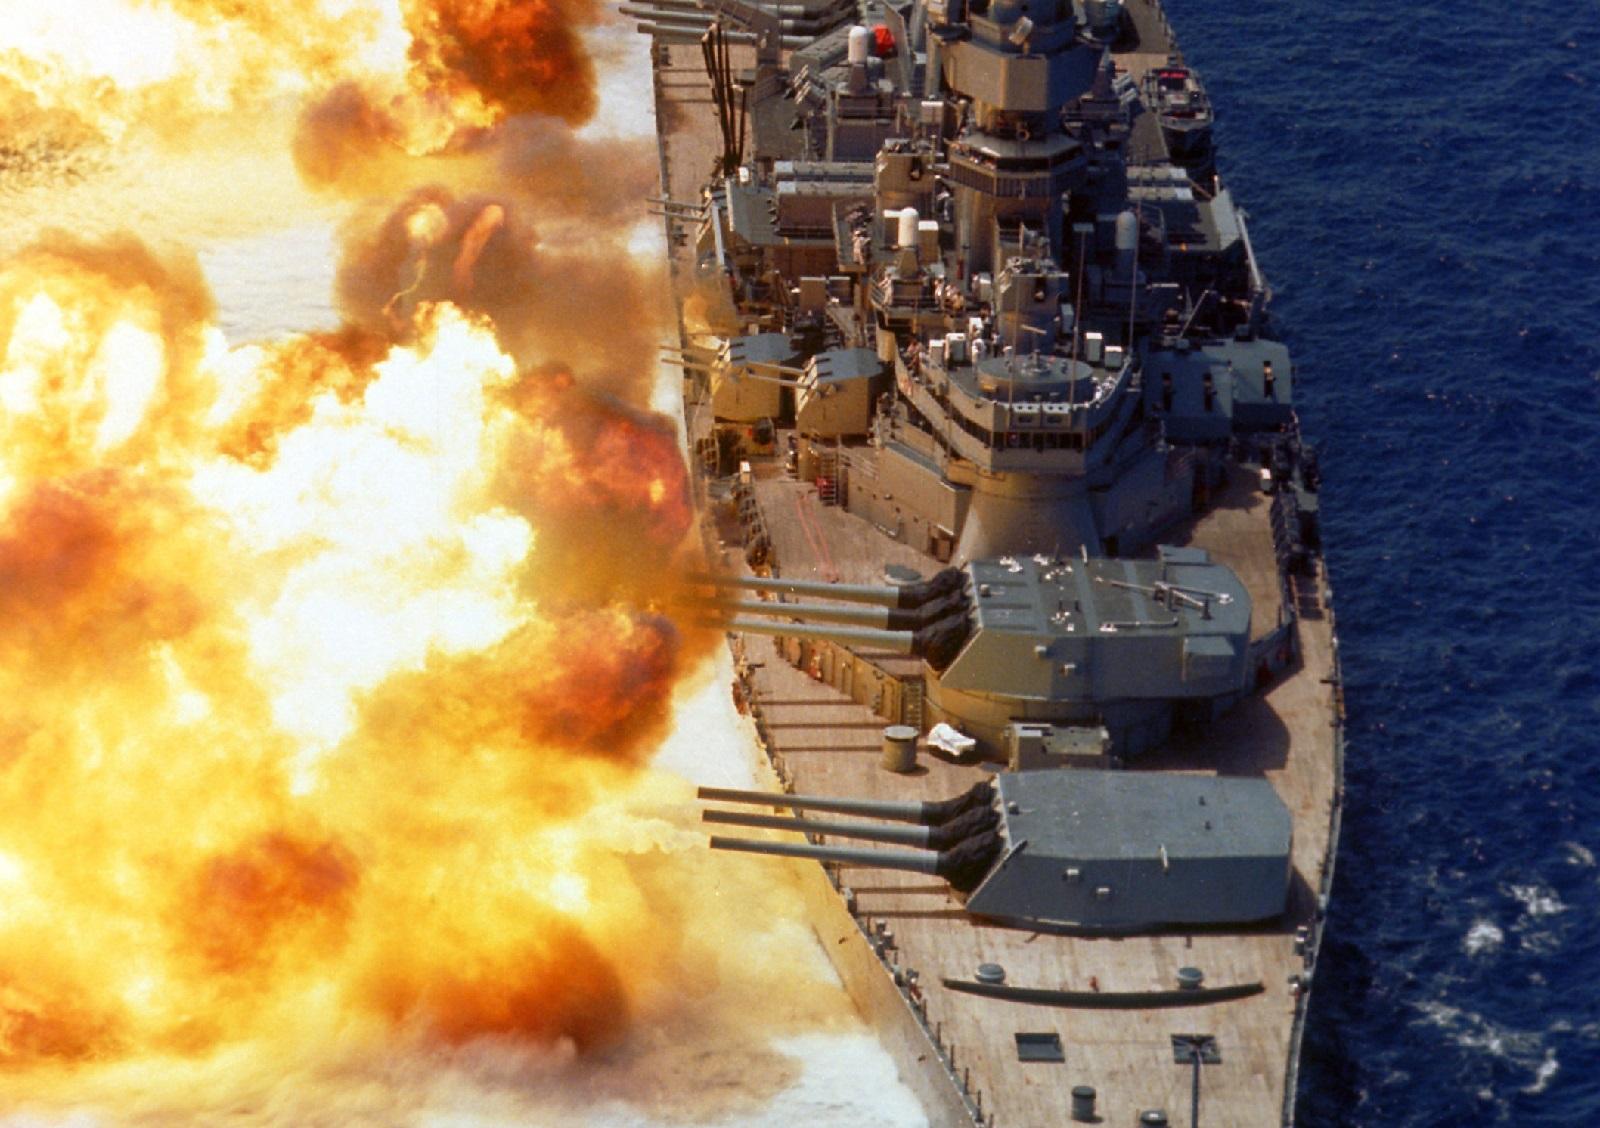 Stealth vs. Battleship: What if America's Last Battleship Attacked the Zumwalt-Class Destroyer?